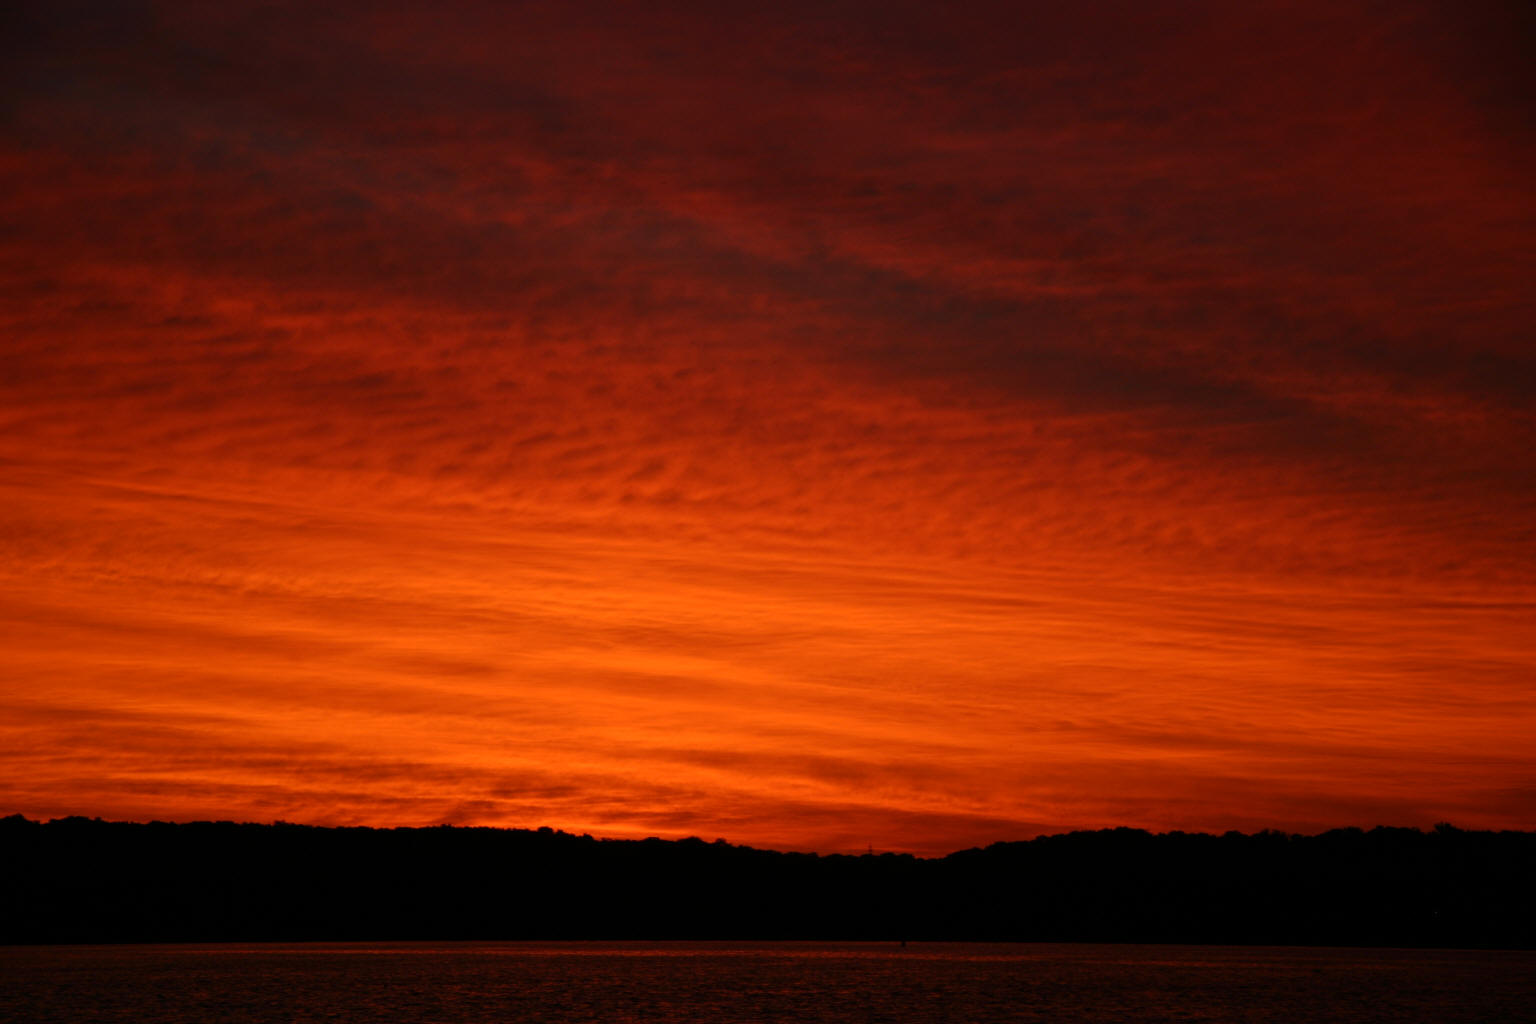 """It's another te-Keokuk sunrise . . ."""